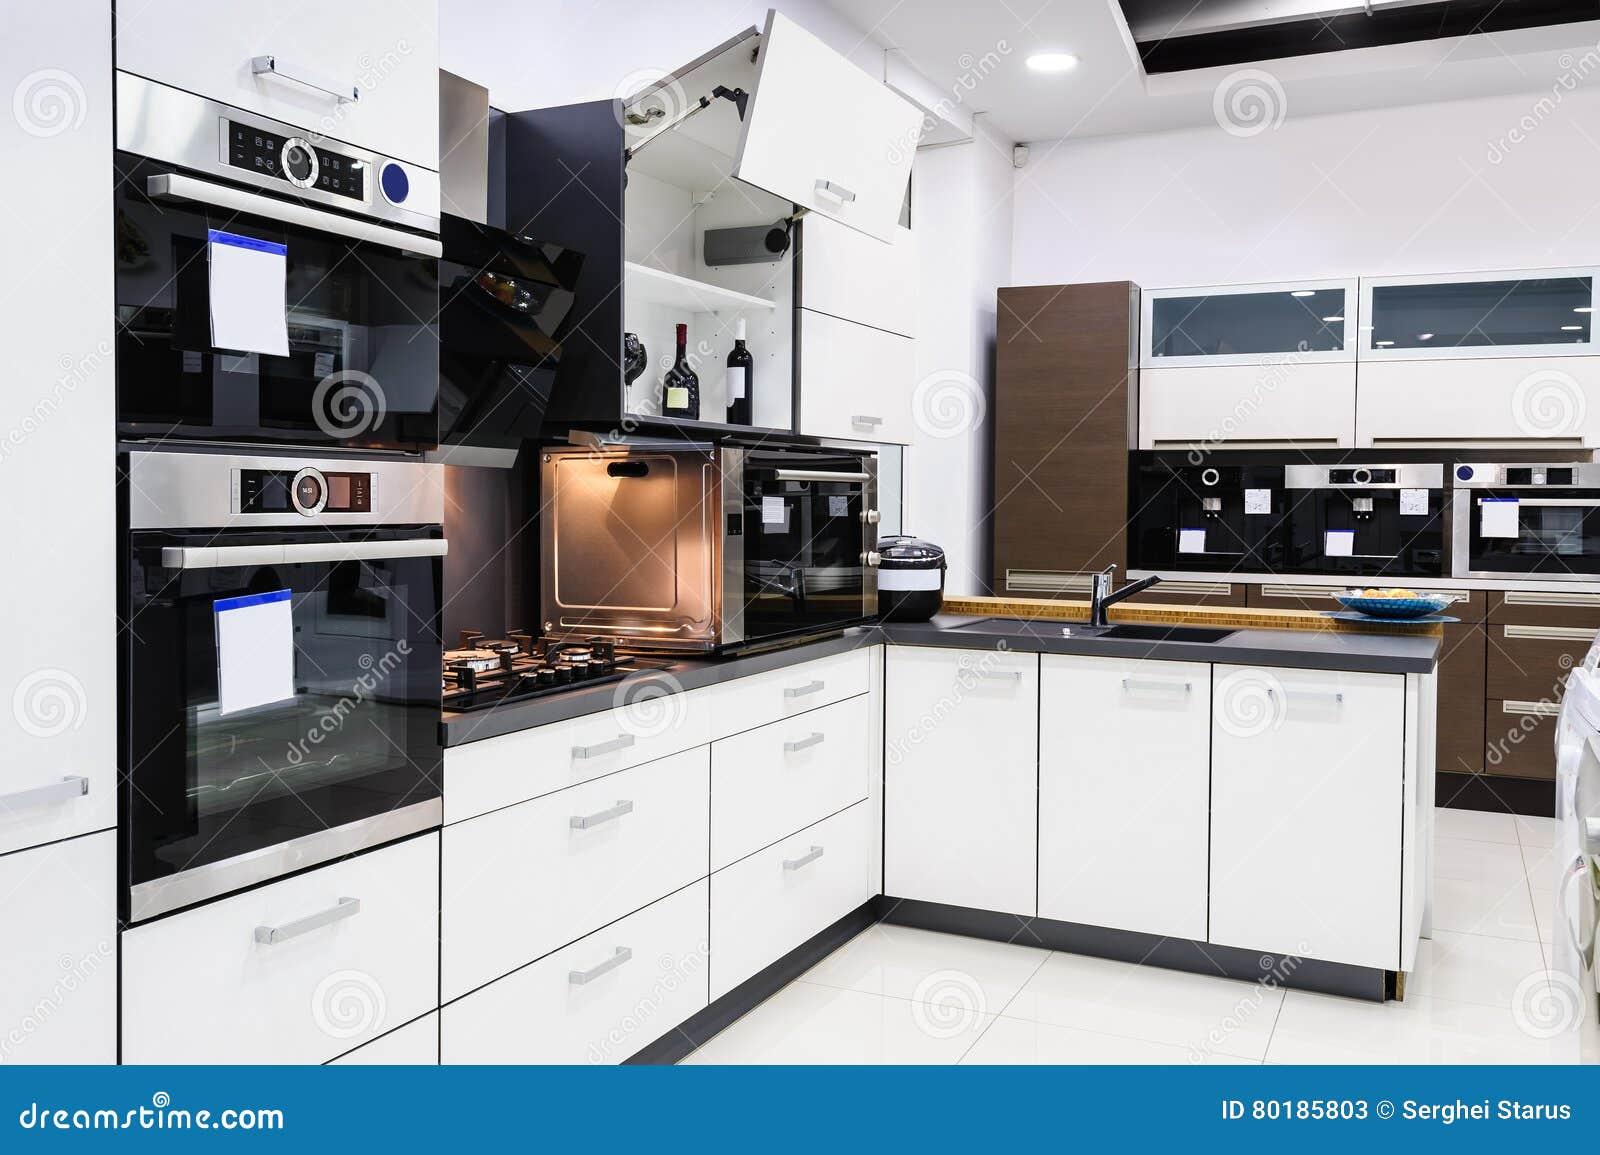 Como disear una cocina moderna awesome winsome fotos de for Una cocina moderna